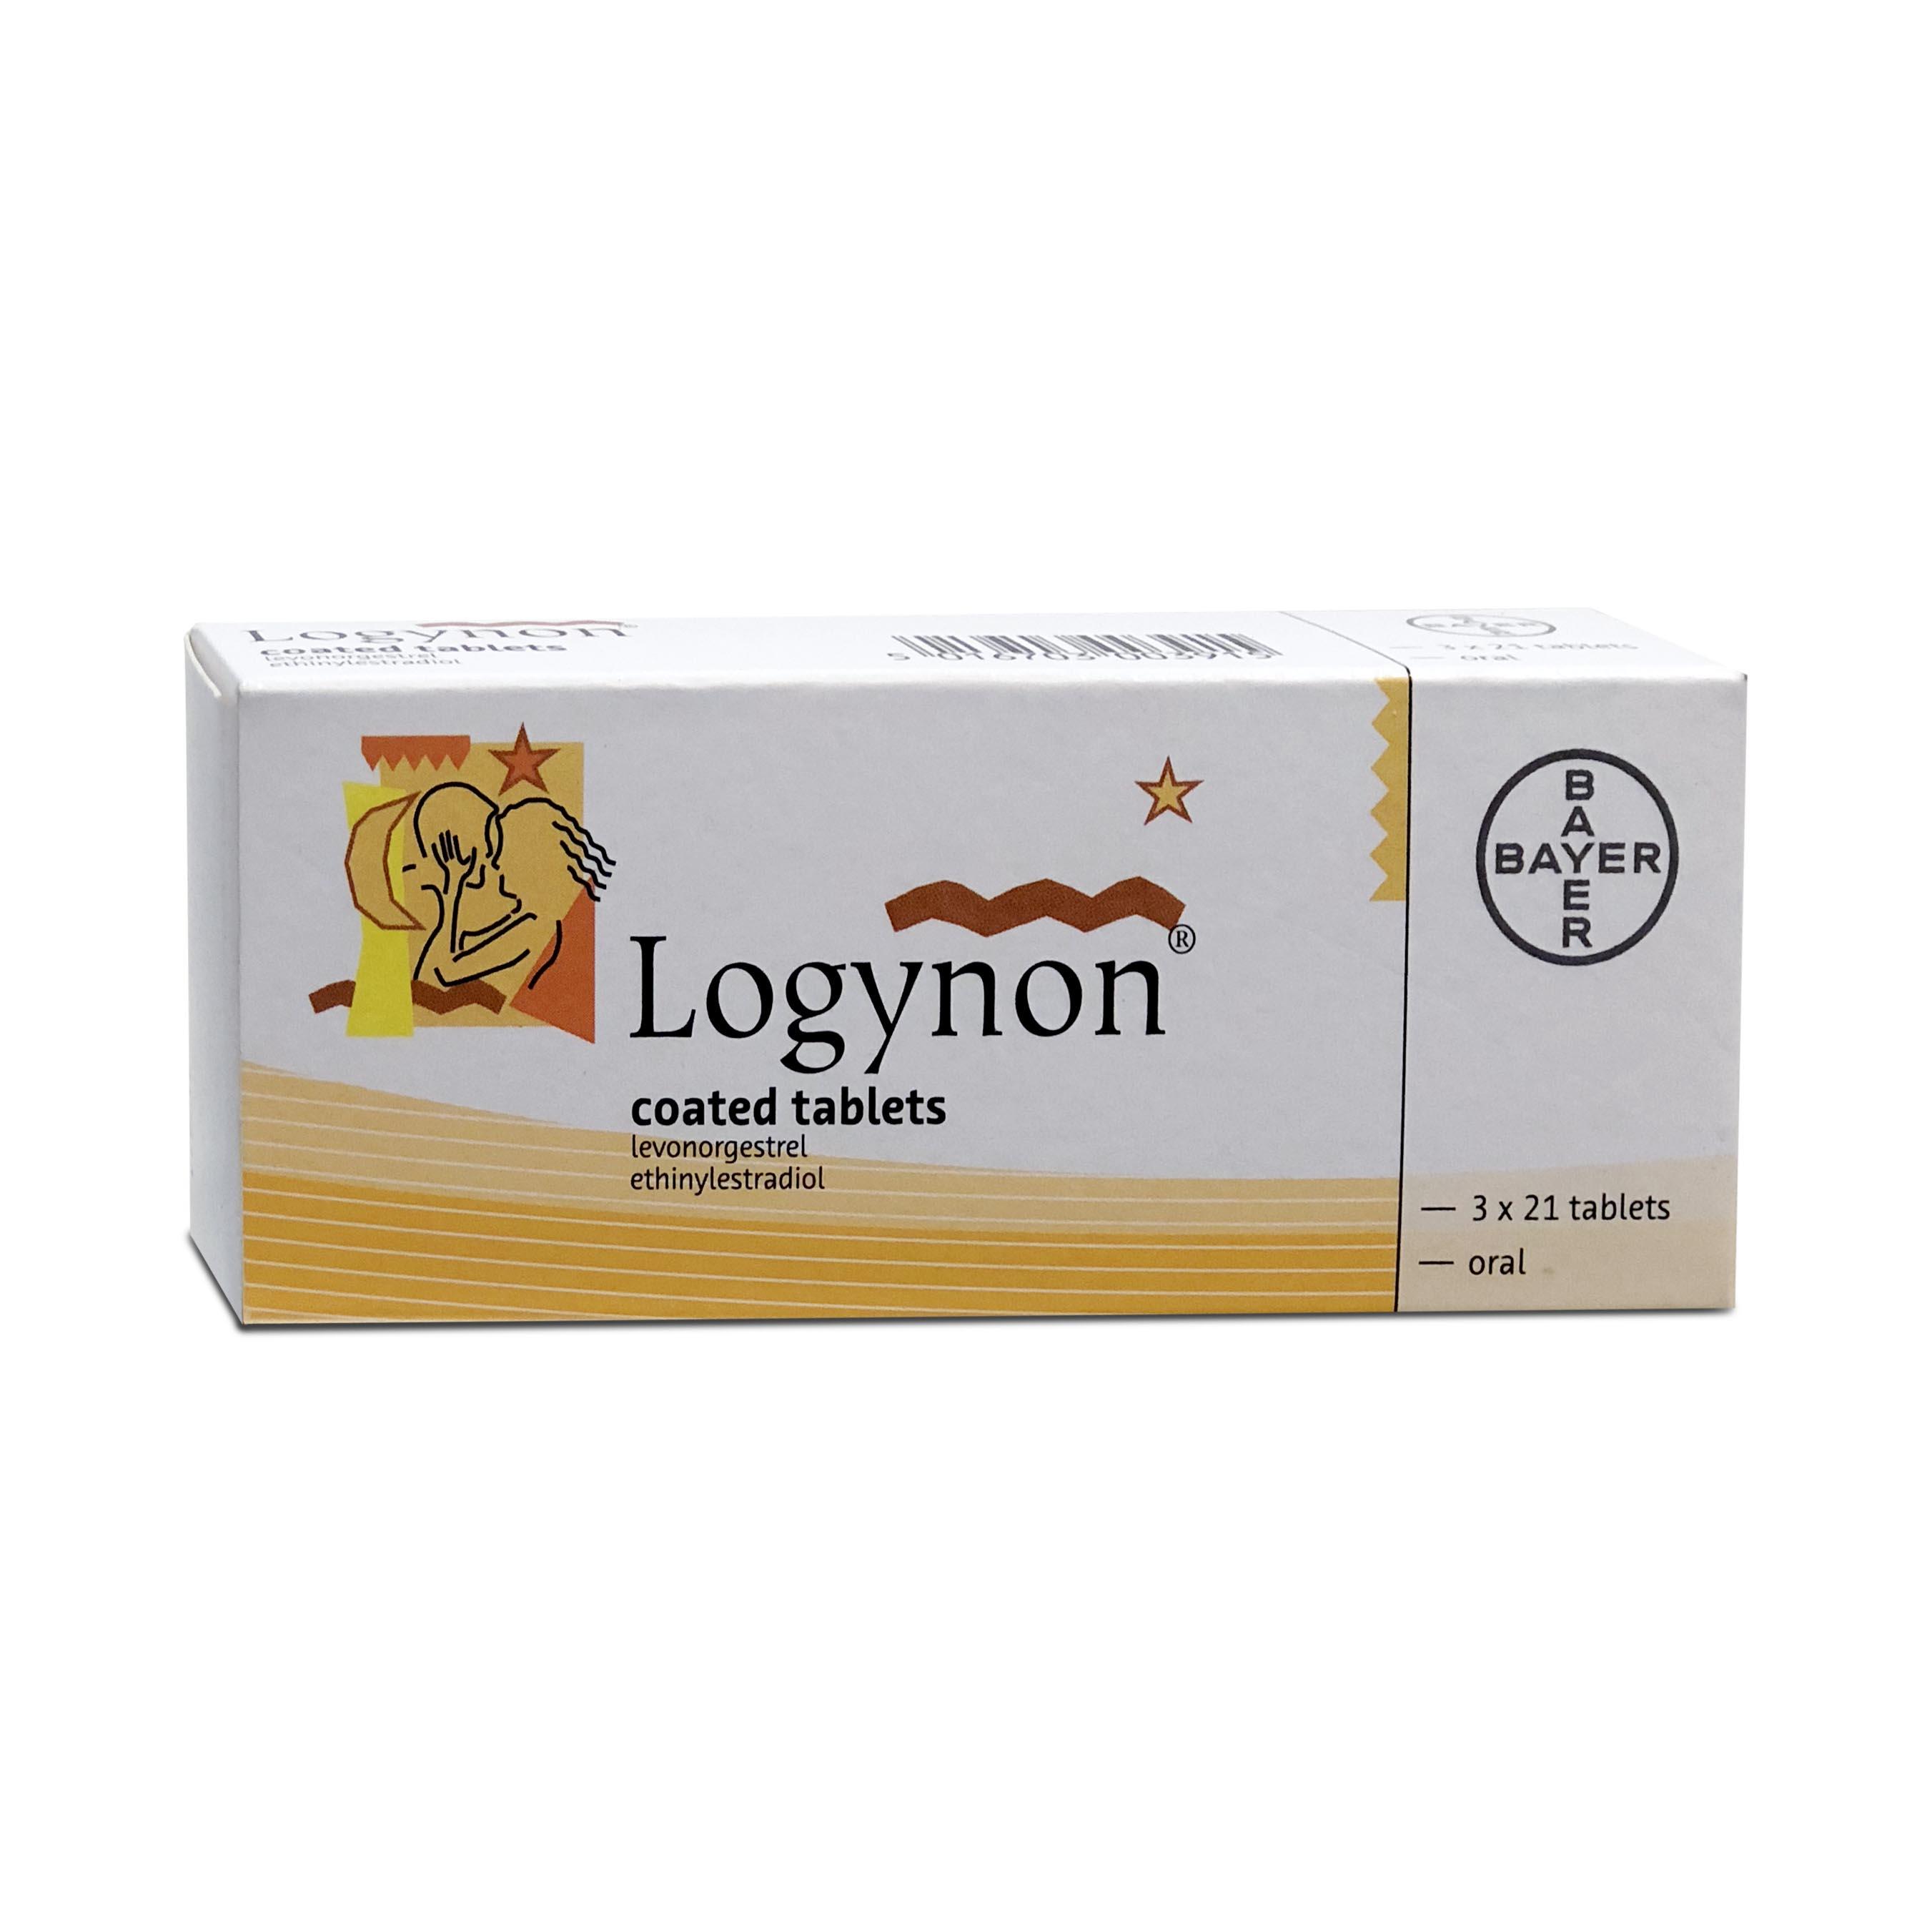 Logynon208